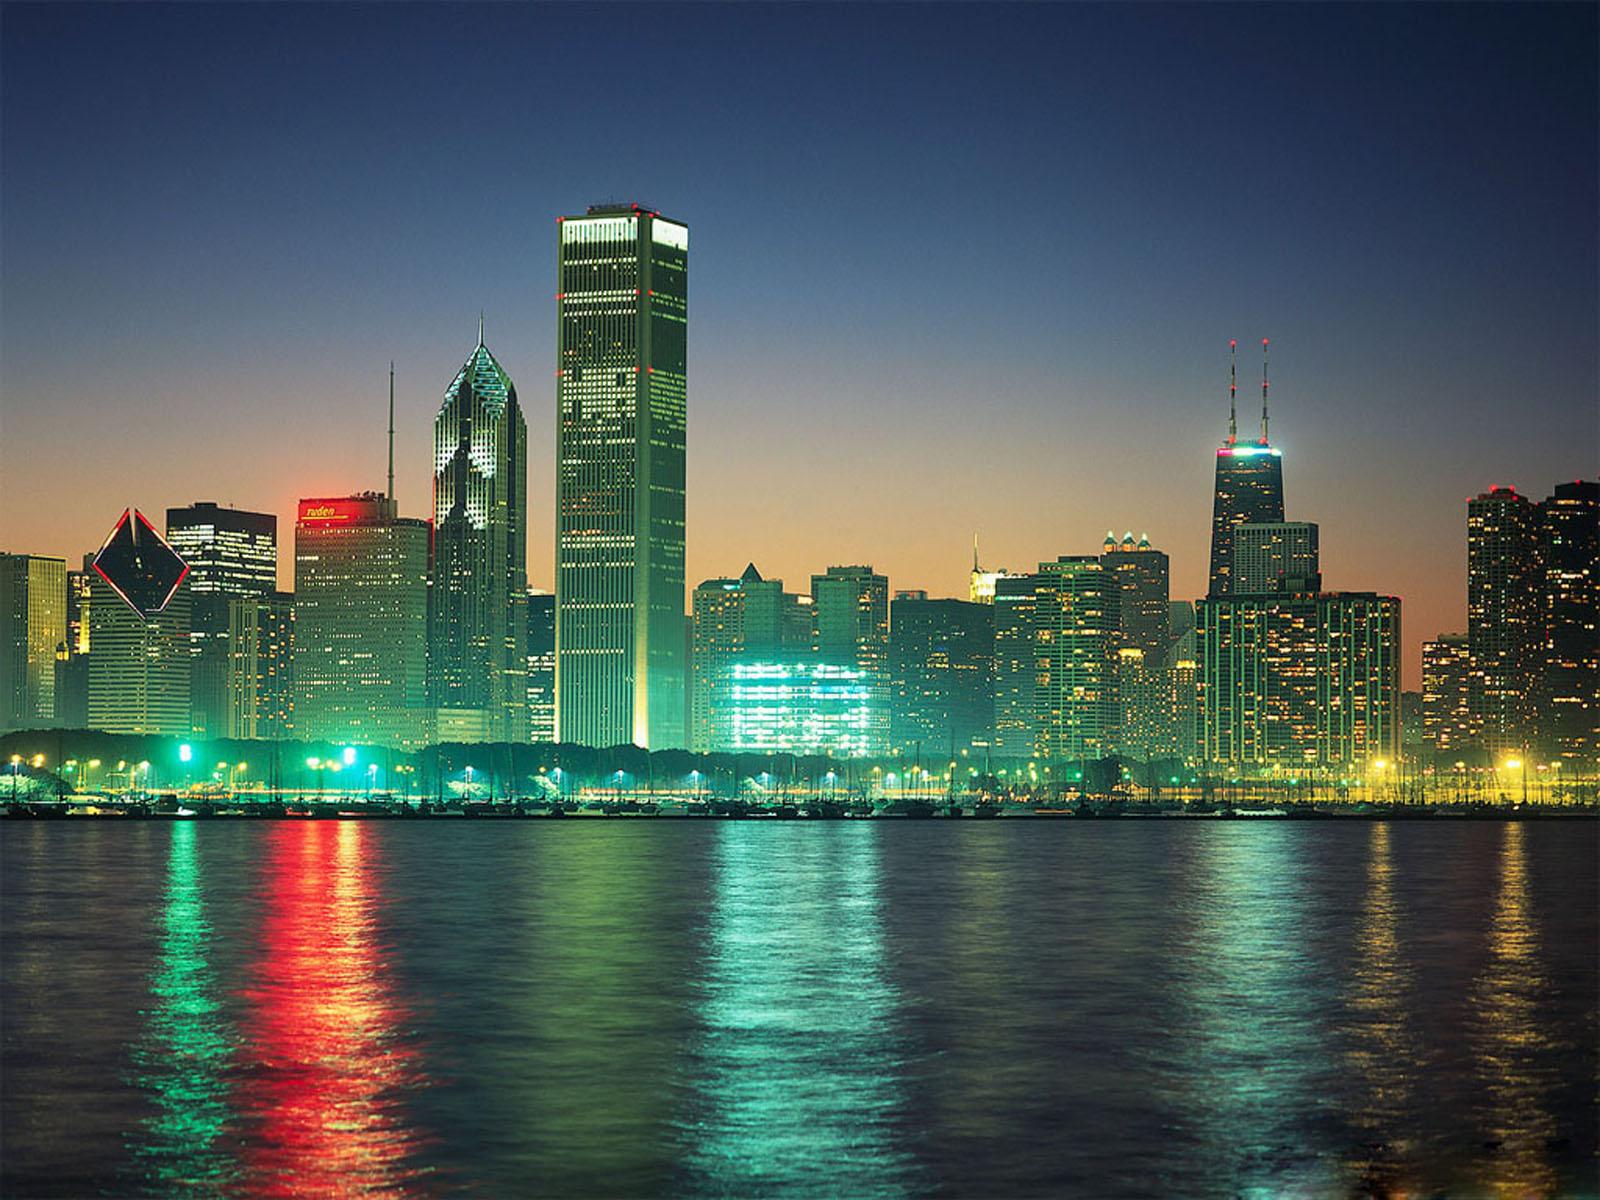 divergent city wallpaper - photo #17